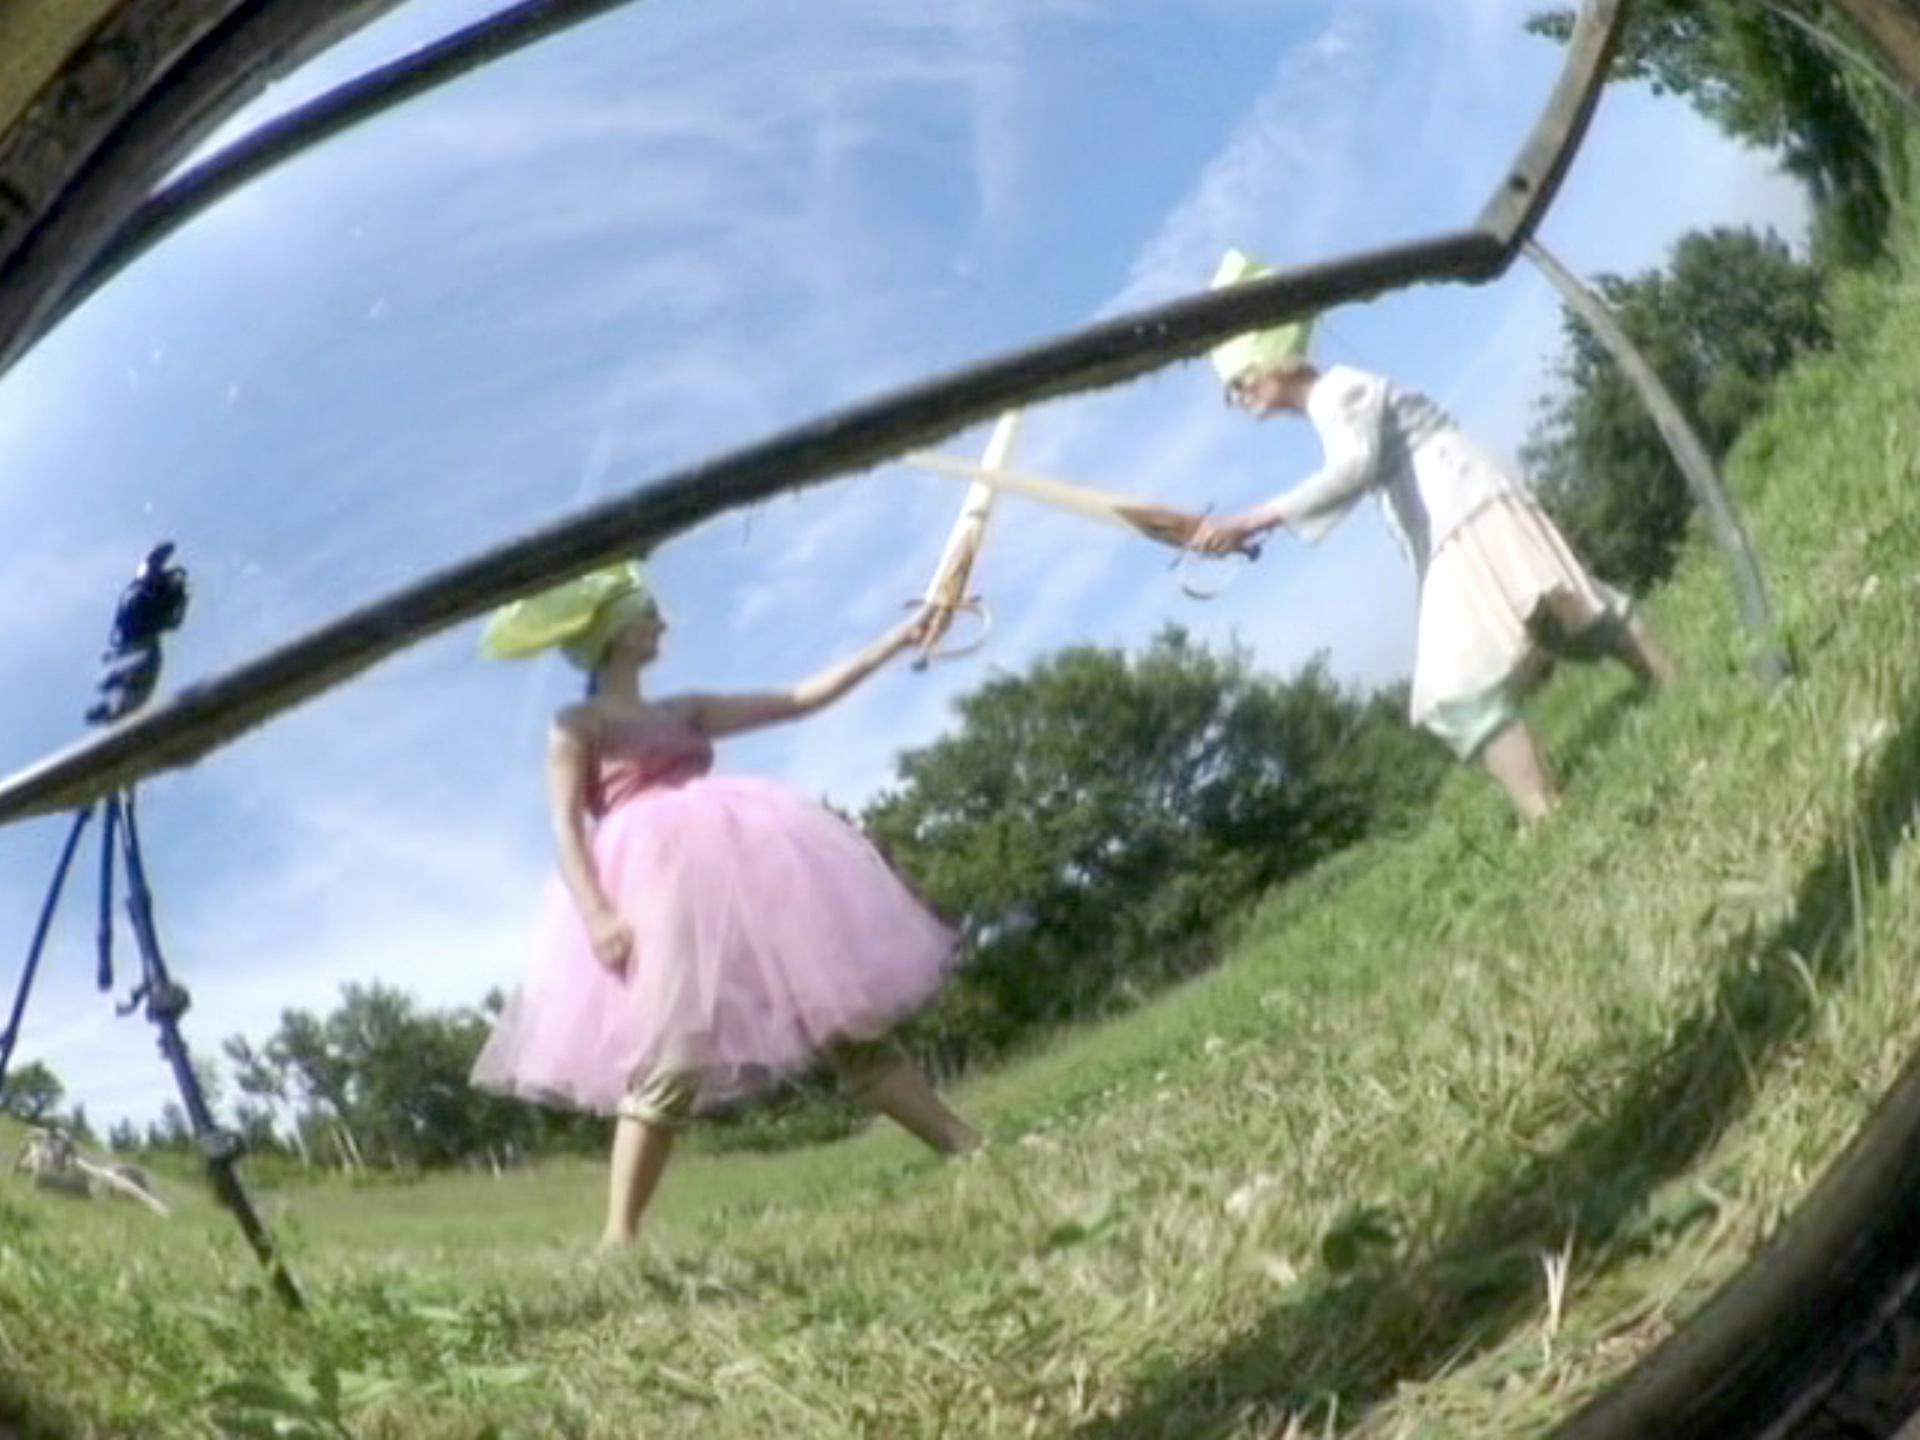 Joan Jonas, Mirror Improvisation, 2004, Video, Courtesy of the artist and Amanda Wilkinson Gallery, London